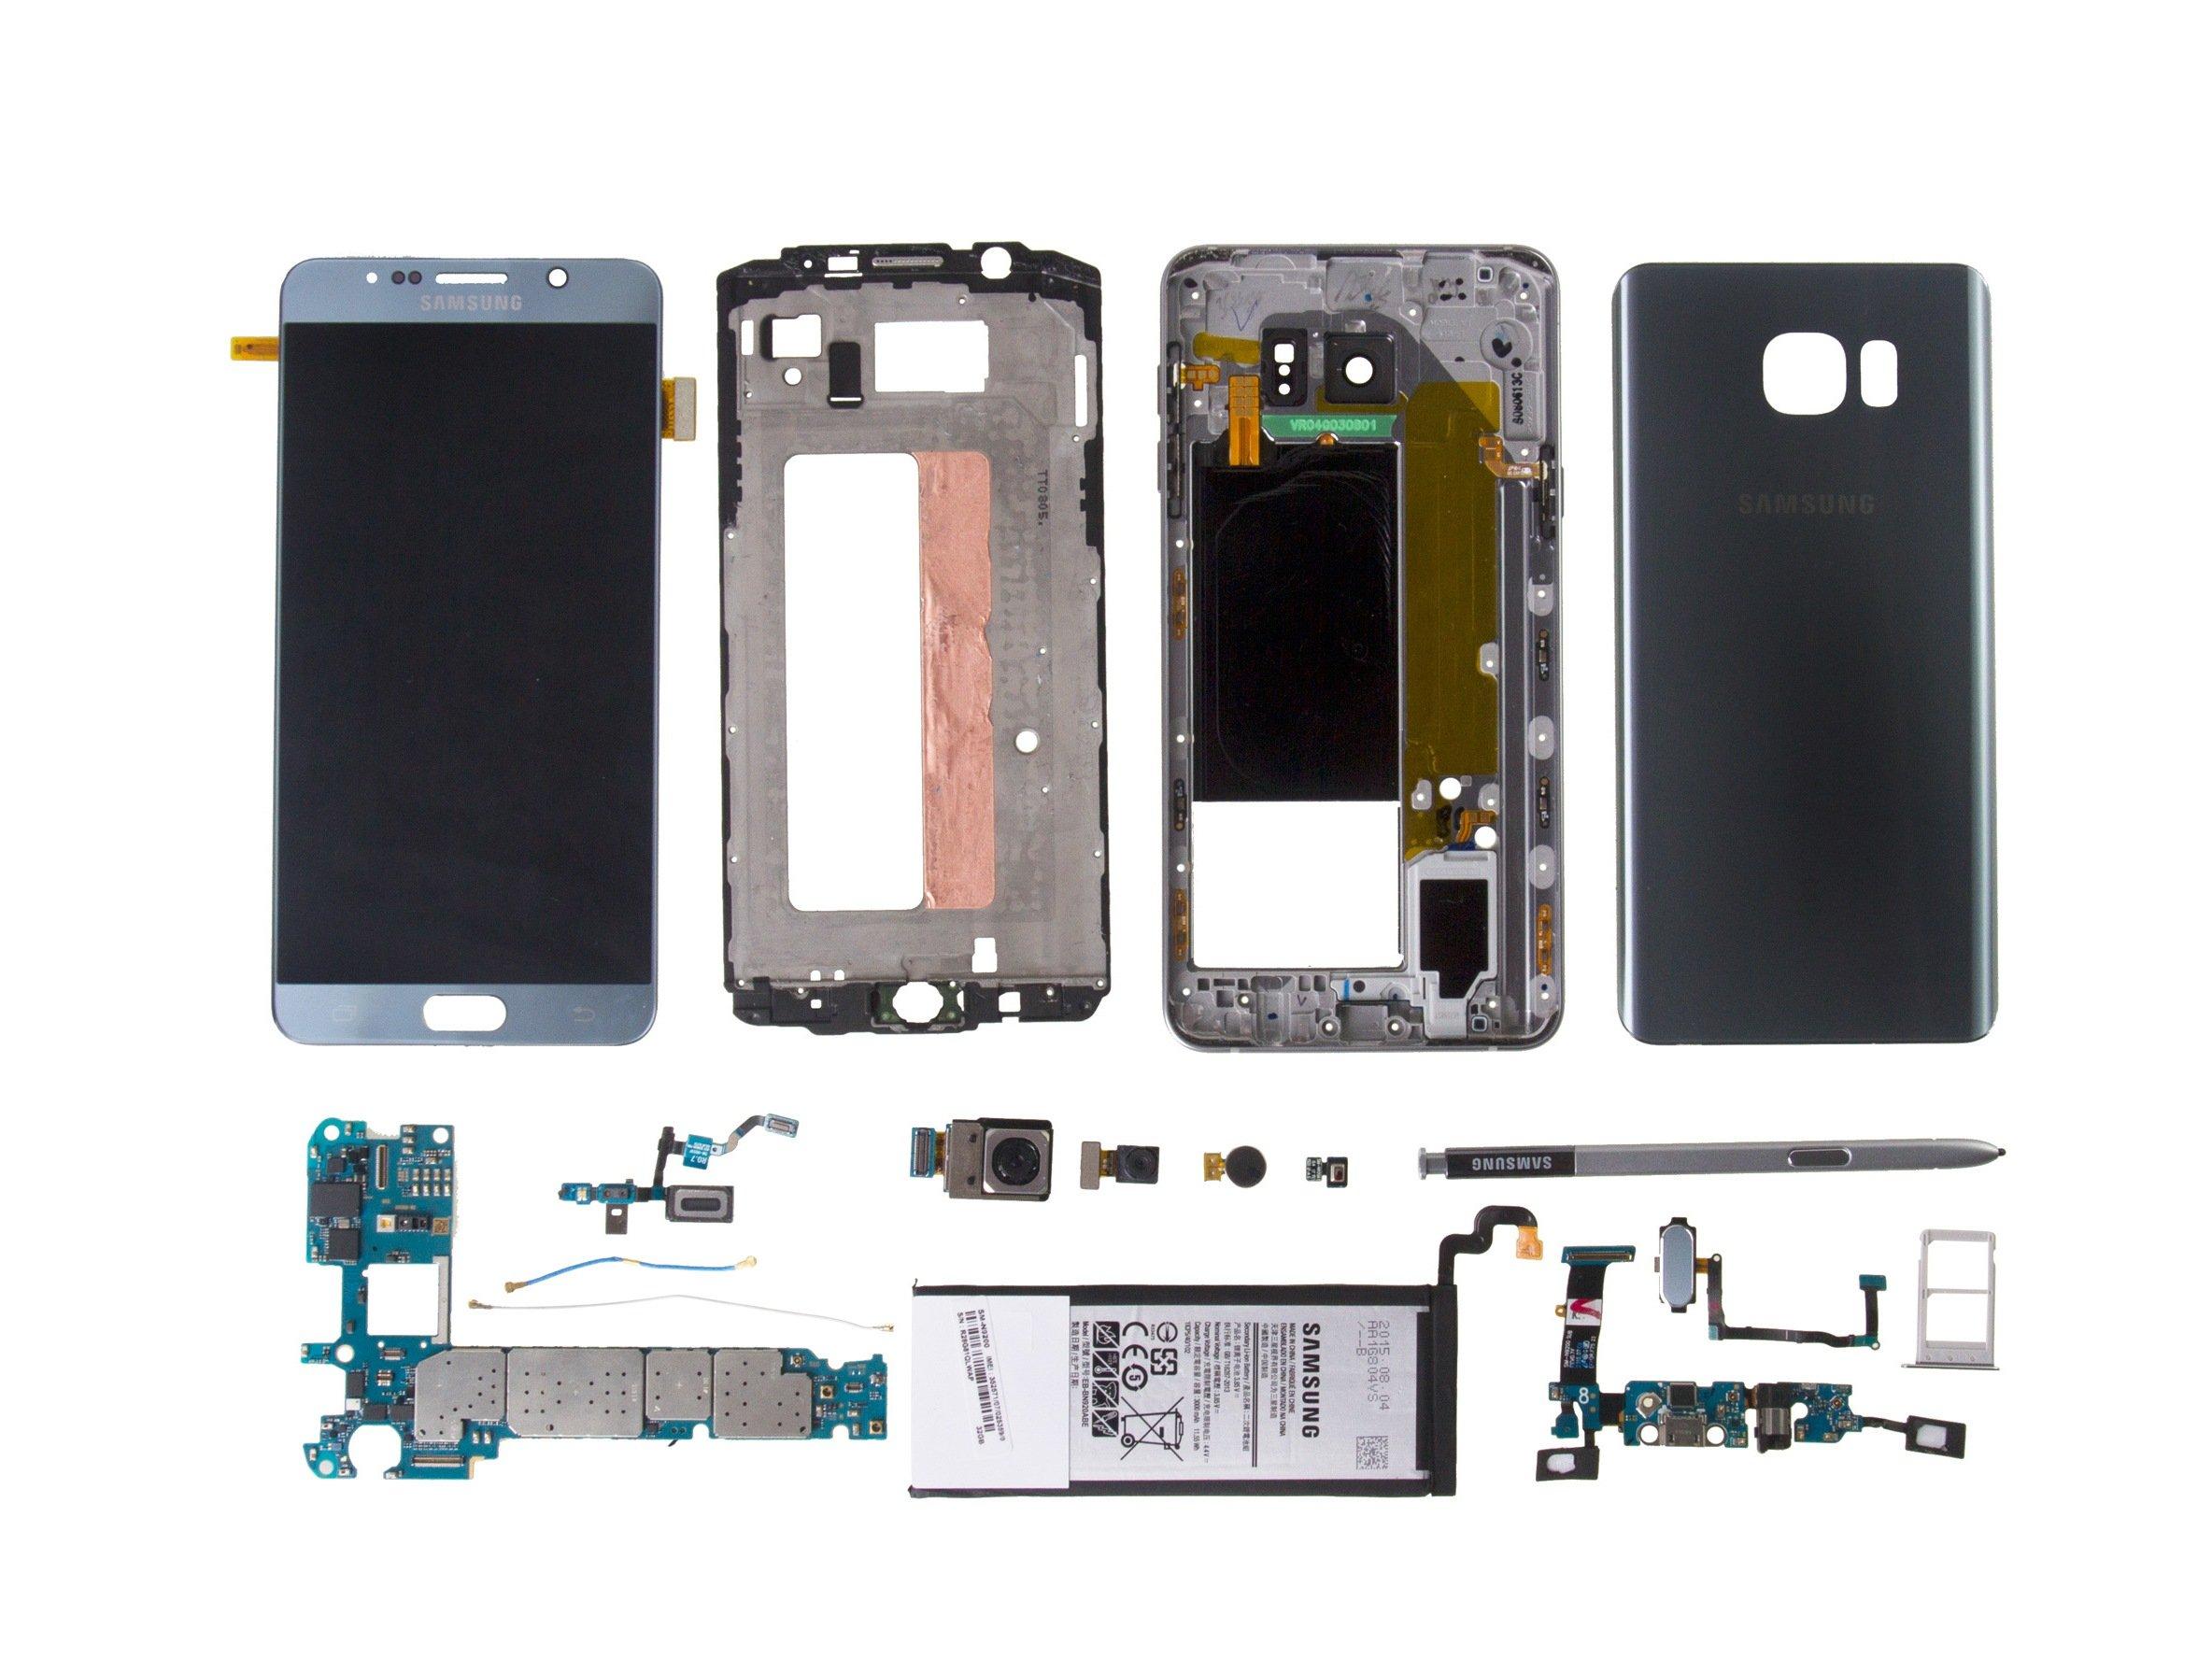 8635dfec695c63 Samsung Galaxy Note5 Teardown - iFixit